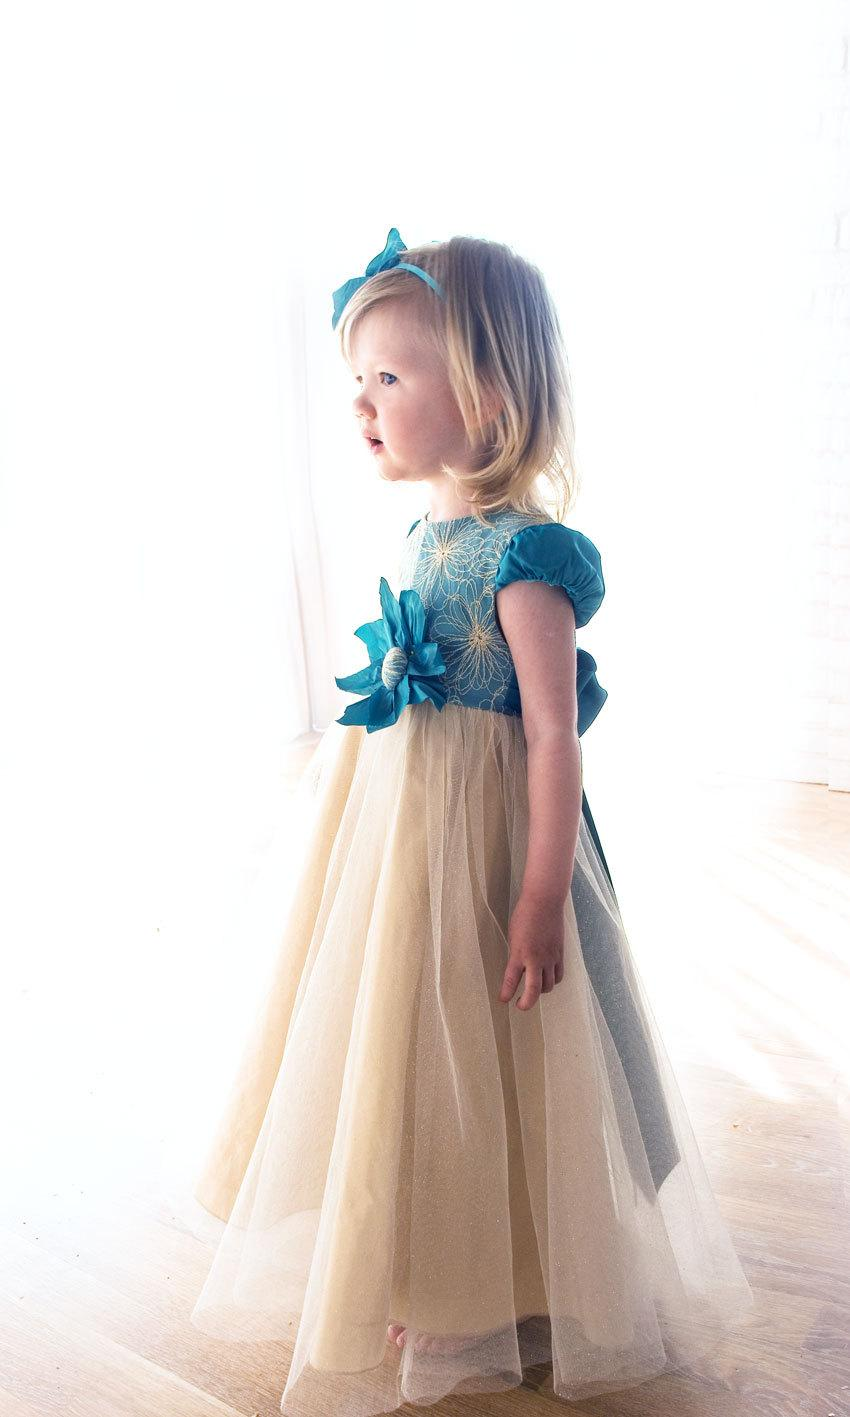 Boda - baby flower dress-gold baby dress-flower girl dress-Handmade in Europe-baby wedding dress-turquoise baby dress-size 18m - 5Y